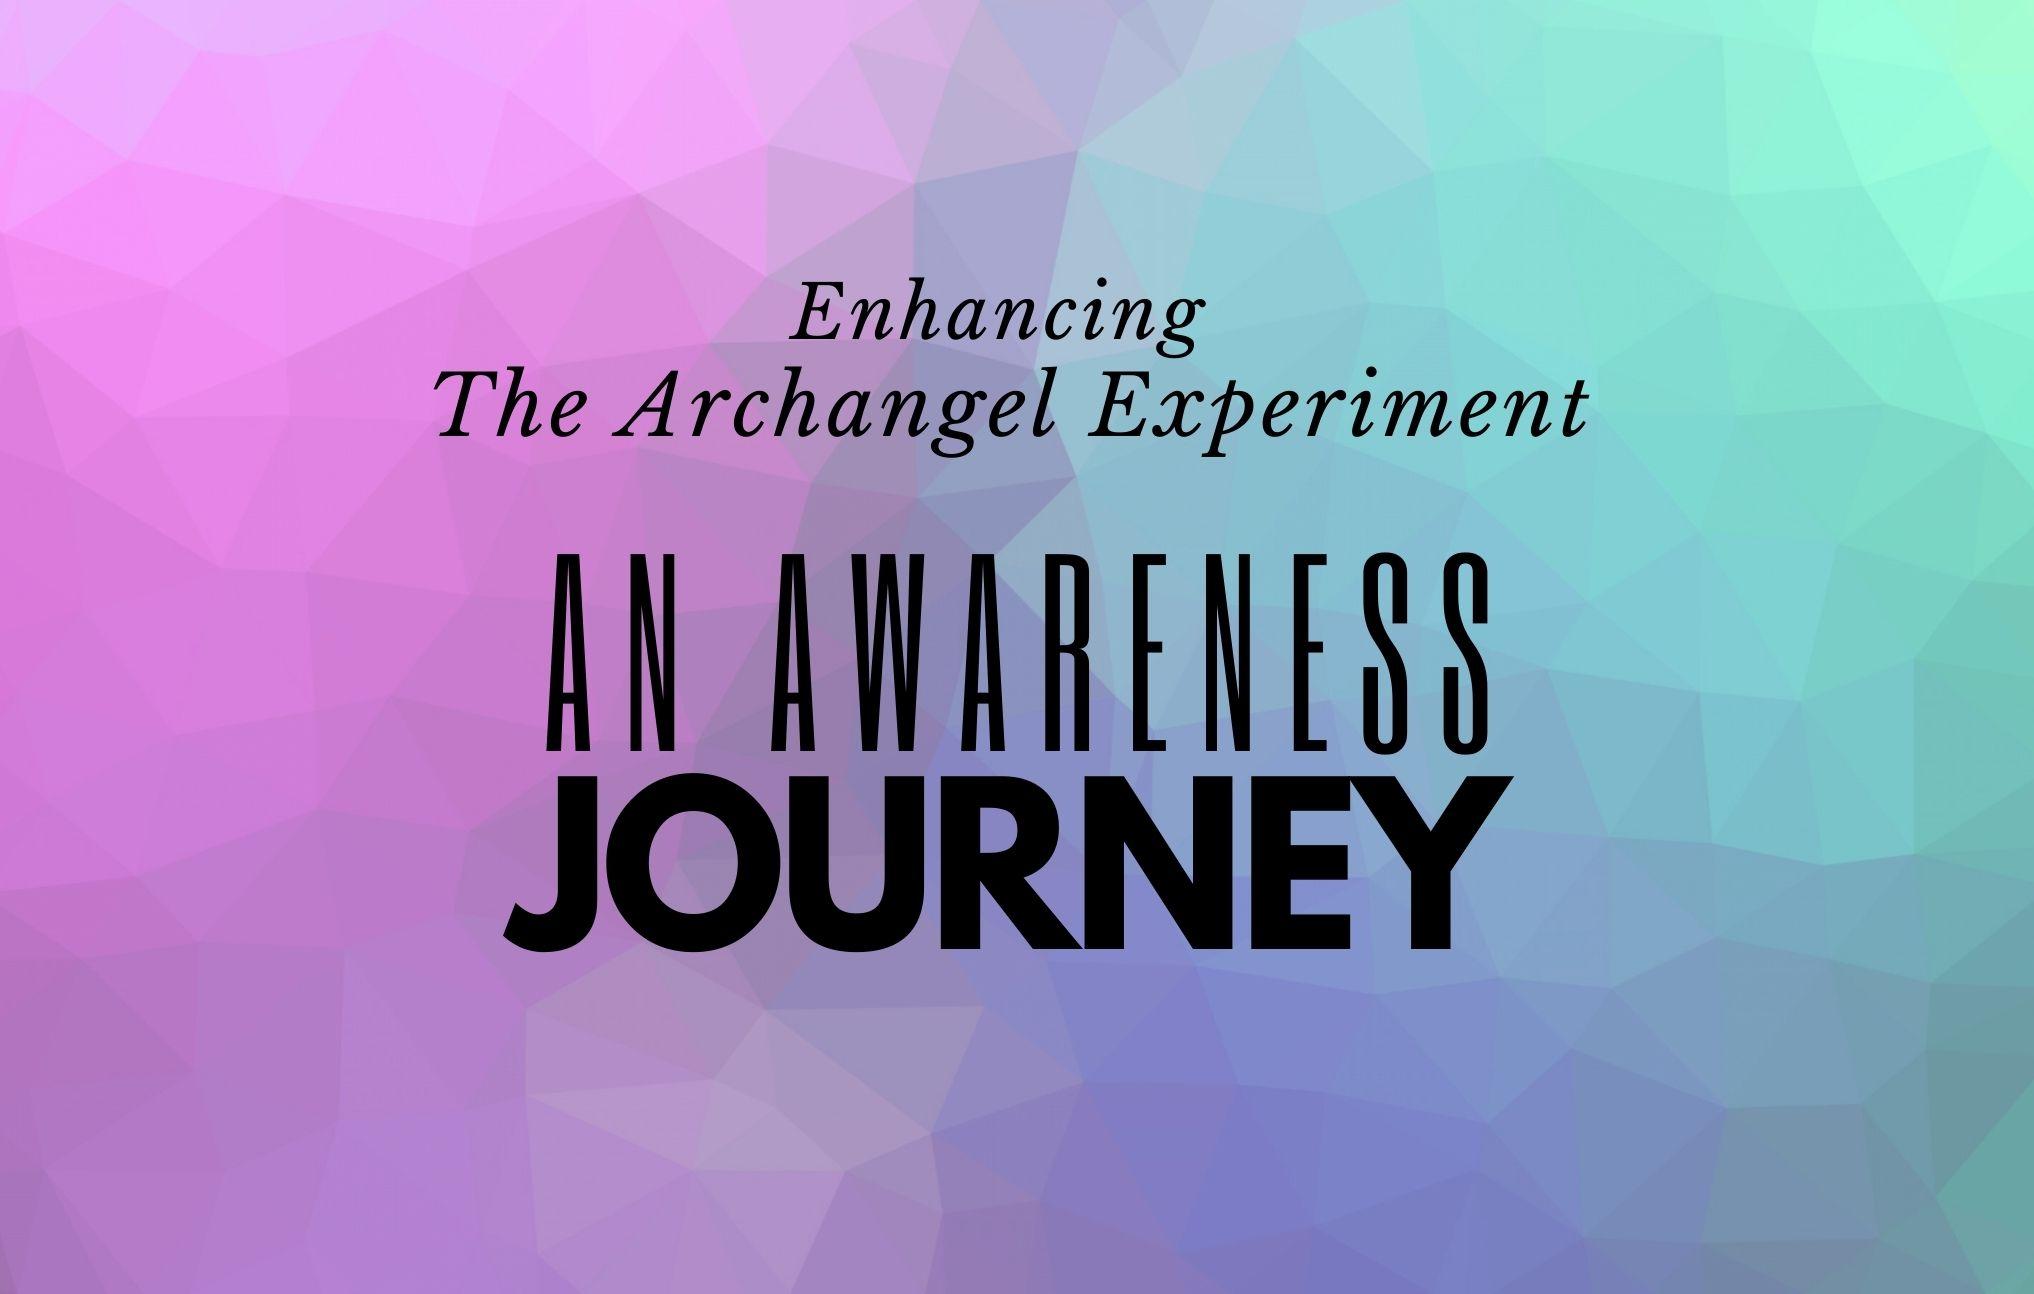 Enhancing the Archangel Experiment: An Awareness Journey